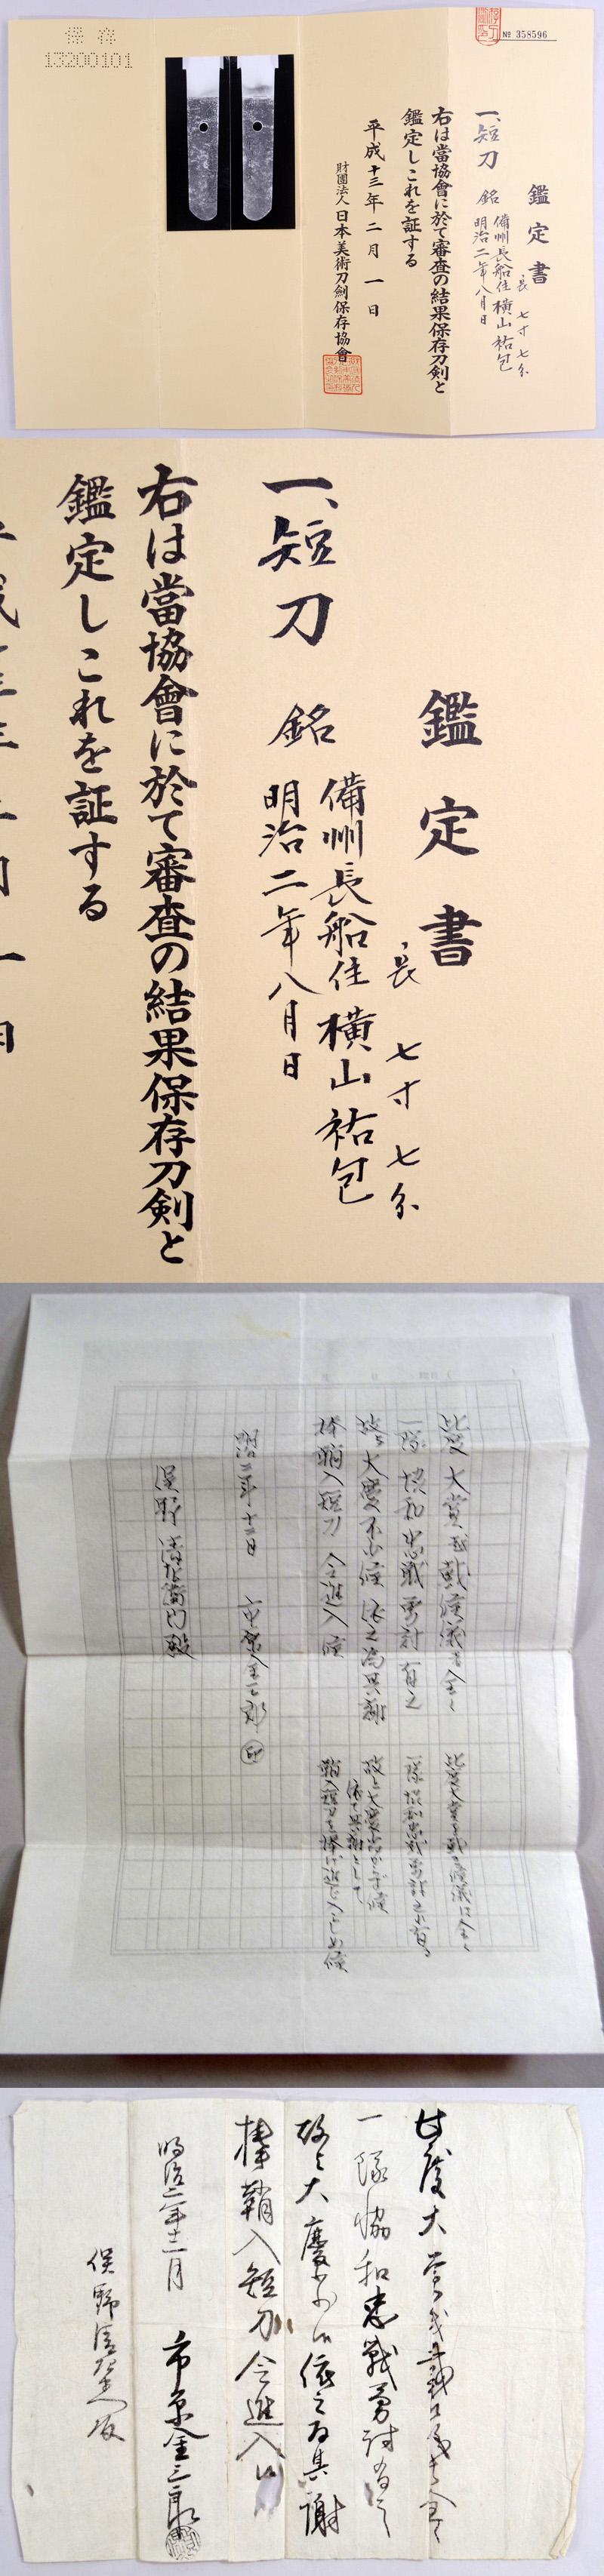 備州長船住横山祐包 Picture of Certificate